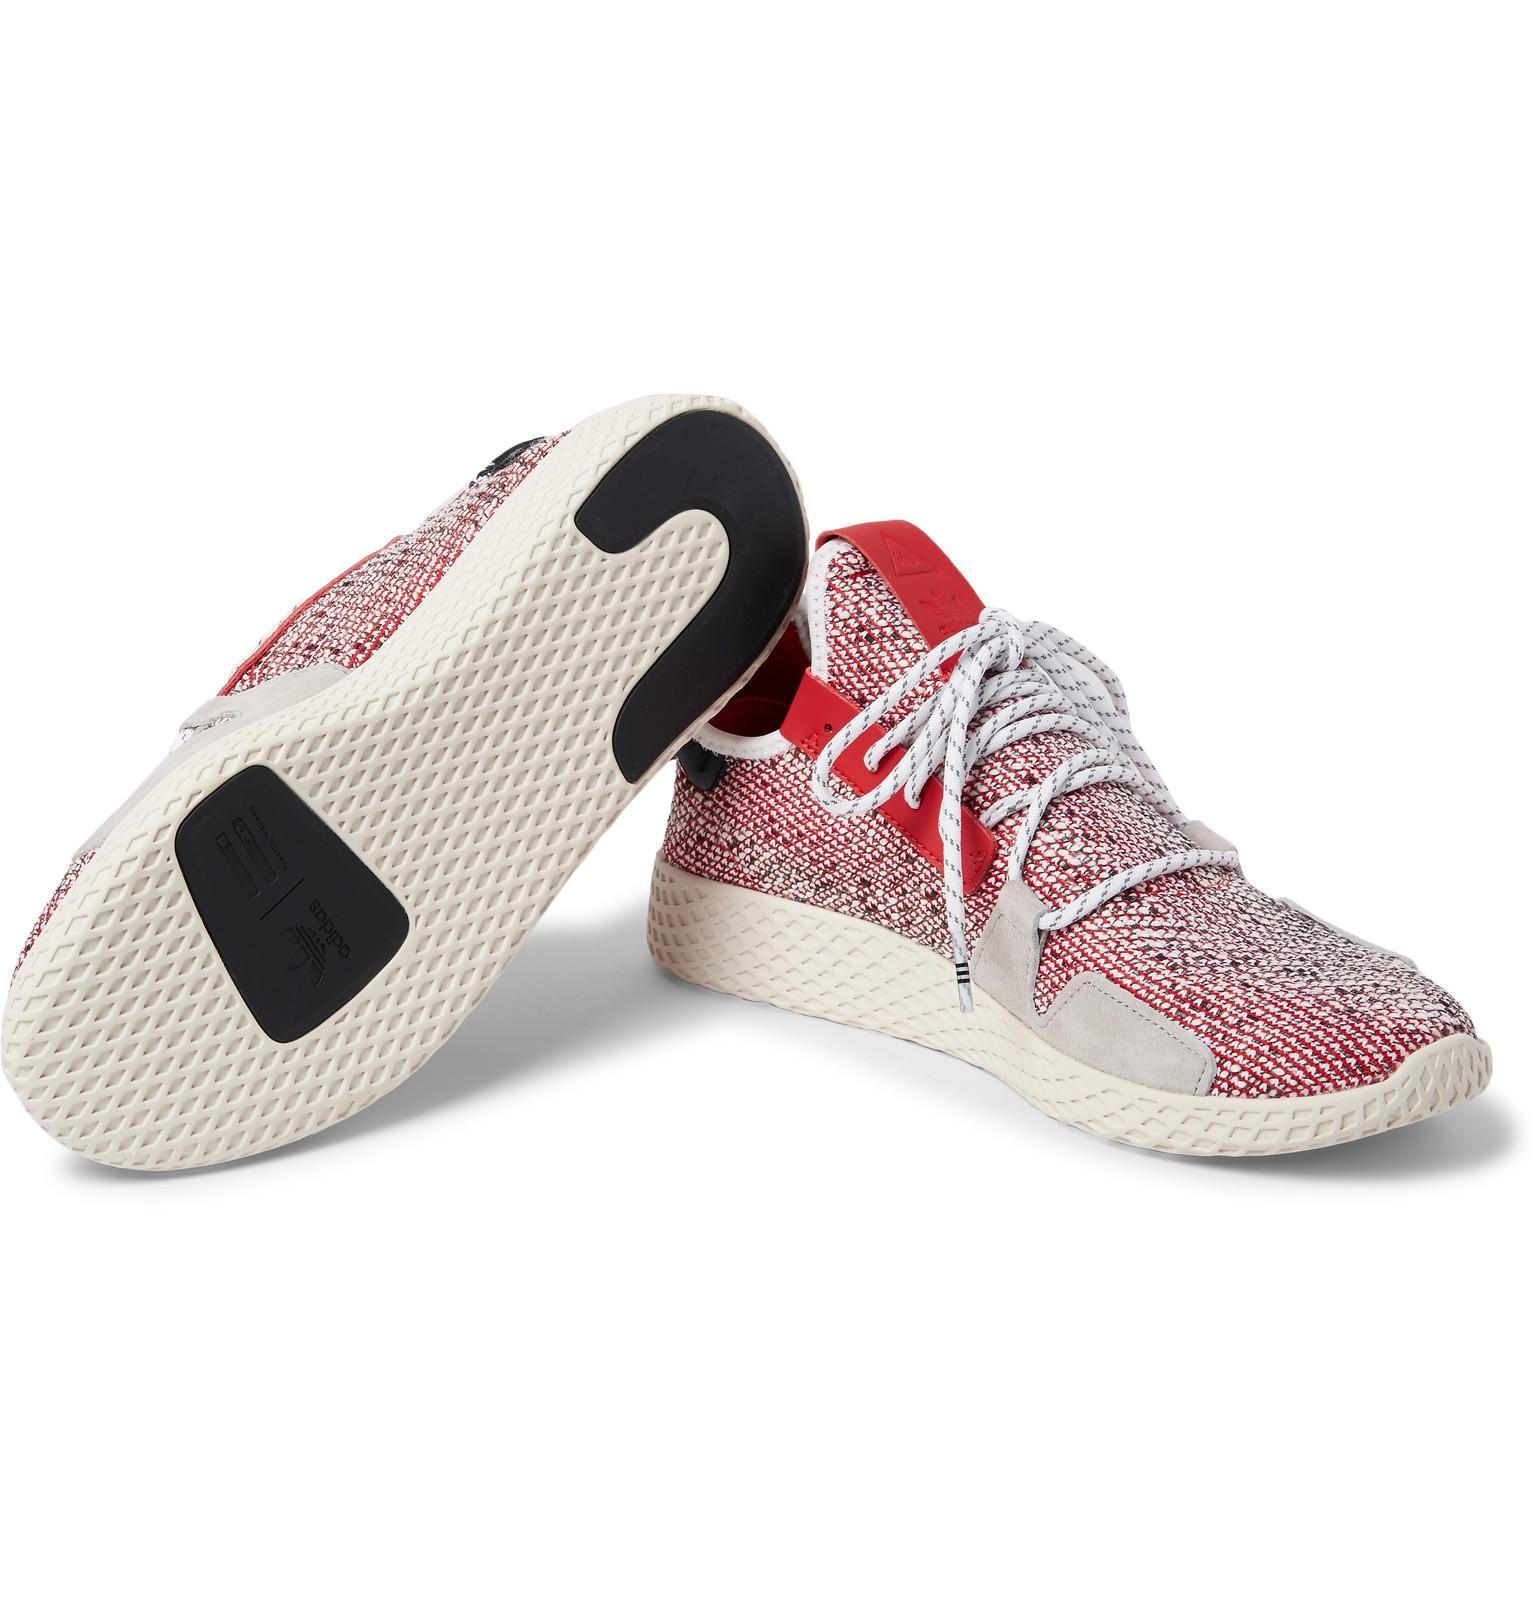 14e68b33d Adidas Originals - Red + Pharrell Williams Solarhu V2 Primeknit Sneakers  for Men - Lyst. View fullscreen